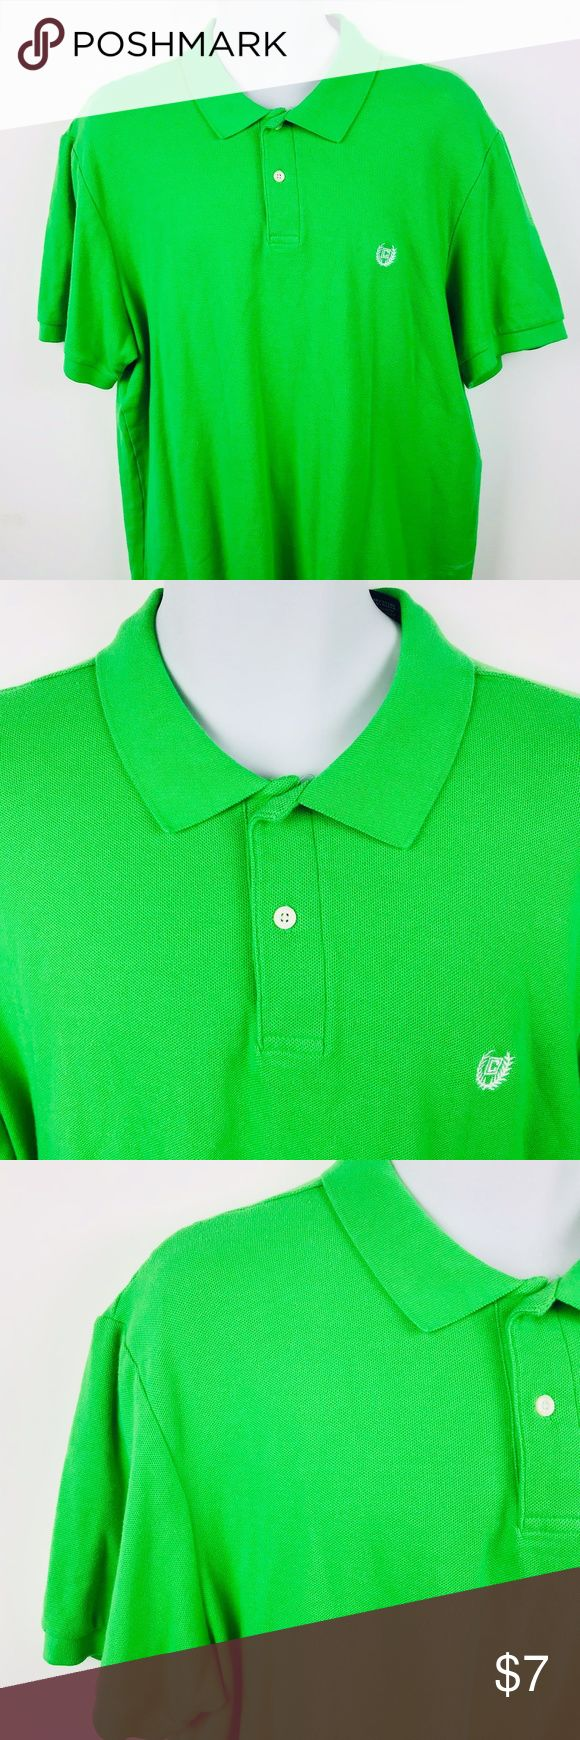 Chaps Shirt size XL Mens Polo Chaps Shirt size XL Mens Green Short Sleeve 100% Cotton Polo  Armpit to Armpit:24.5 Length:31 Chaps Shirts Polos